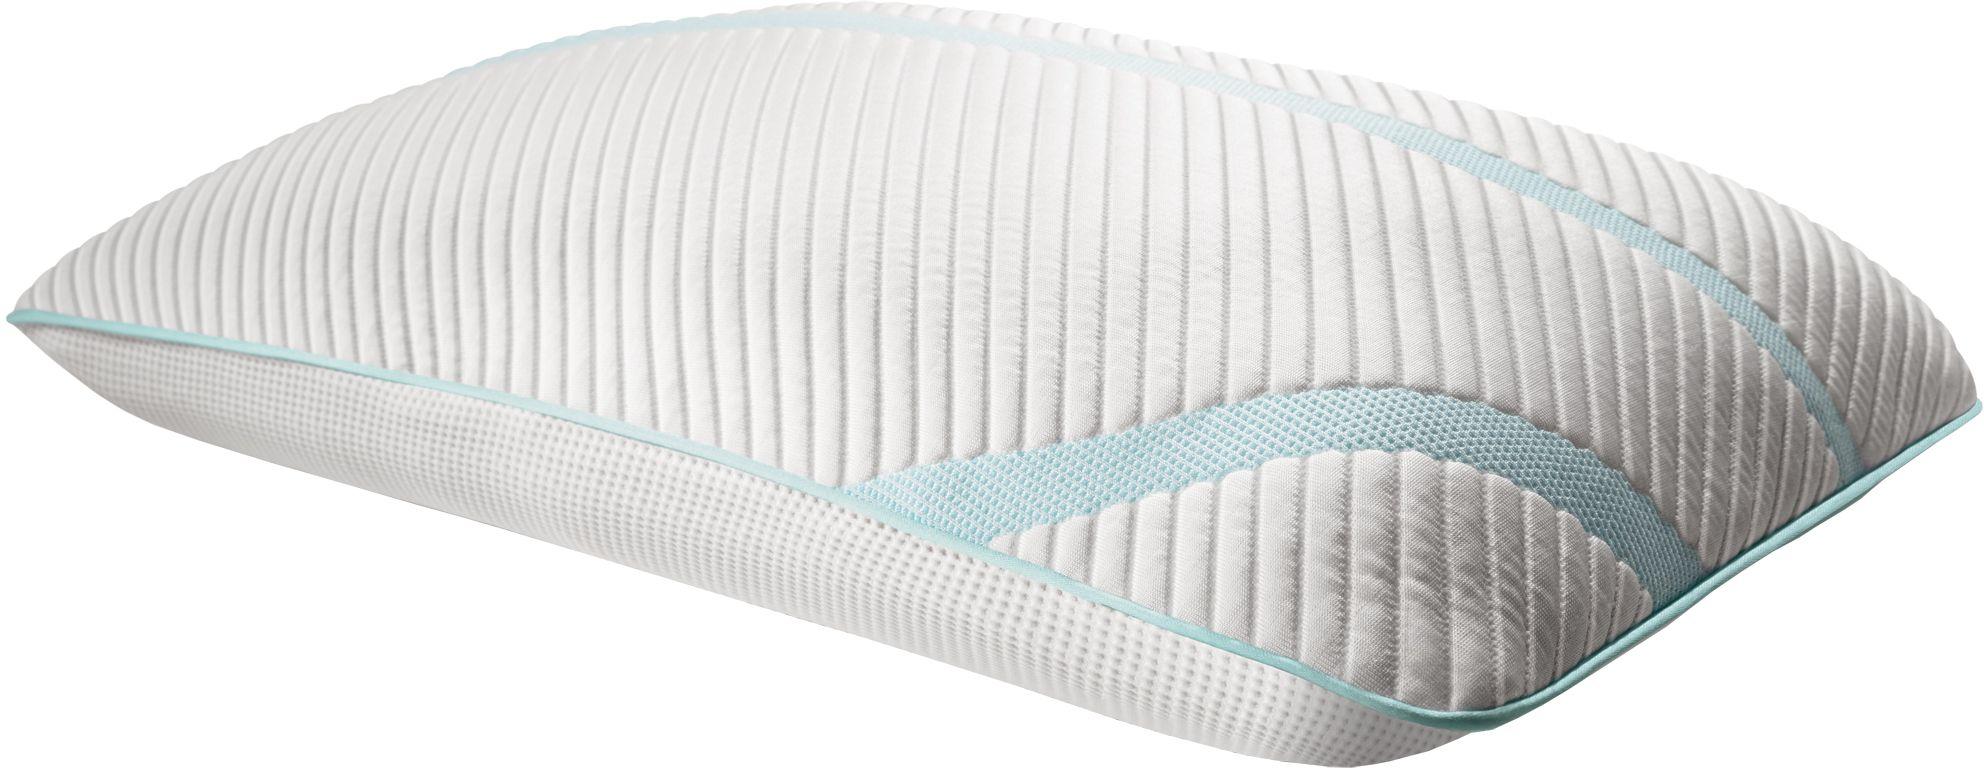 Tempur Pedic 174 Tempur Adapt 174 Prolo Cooling Pillow Queen